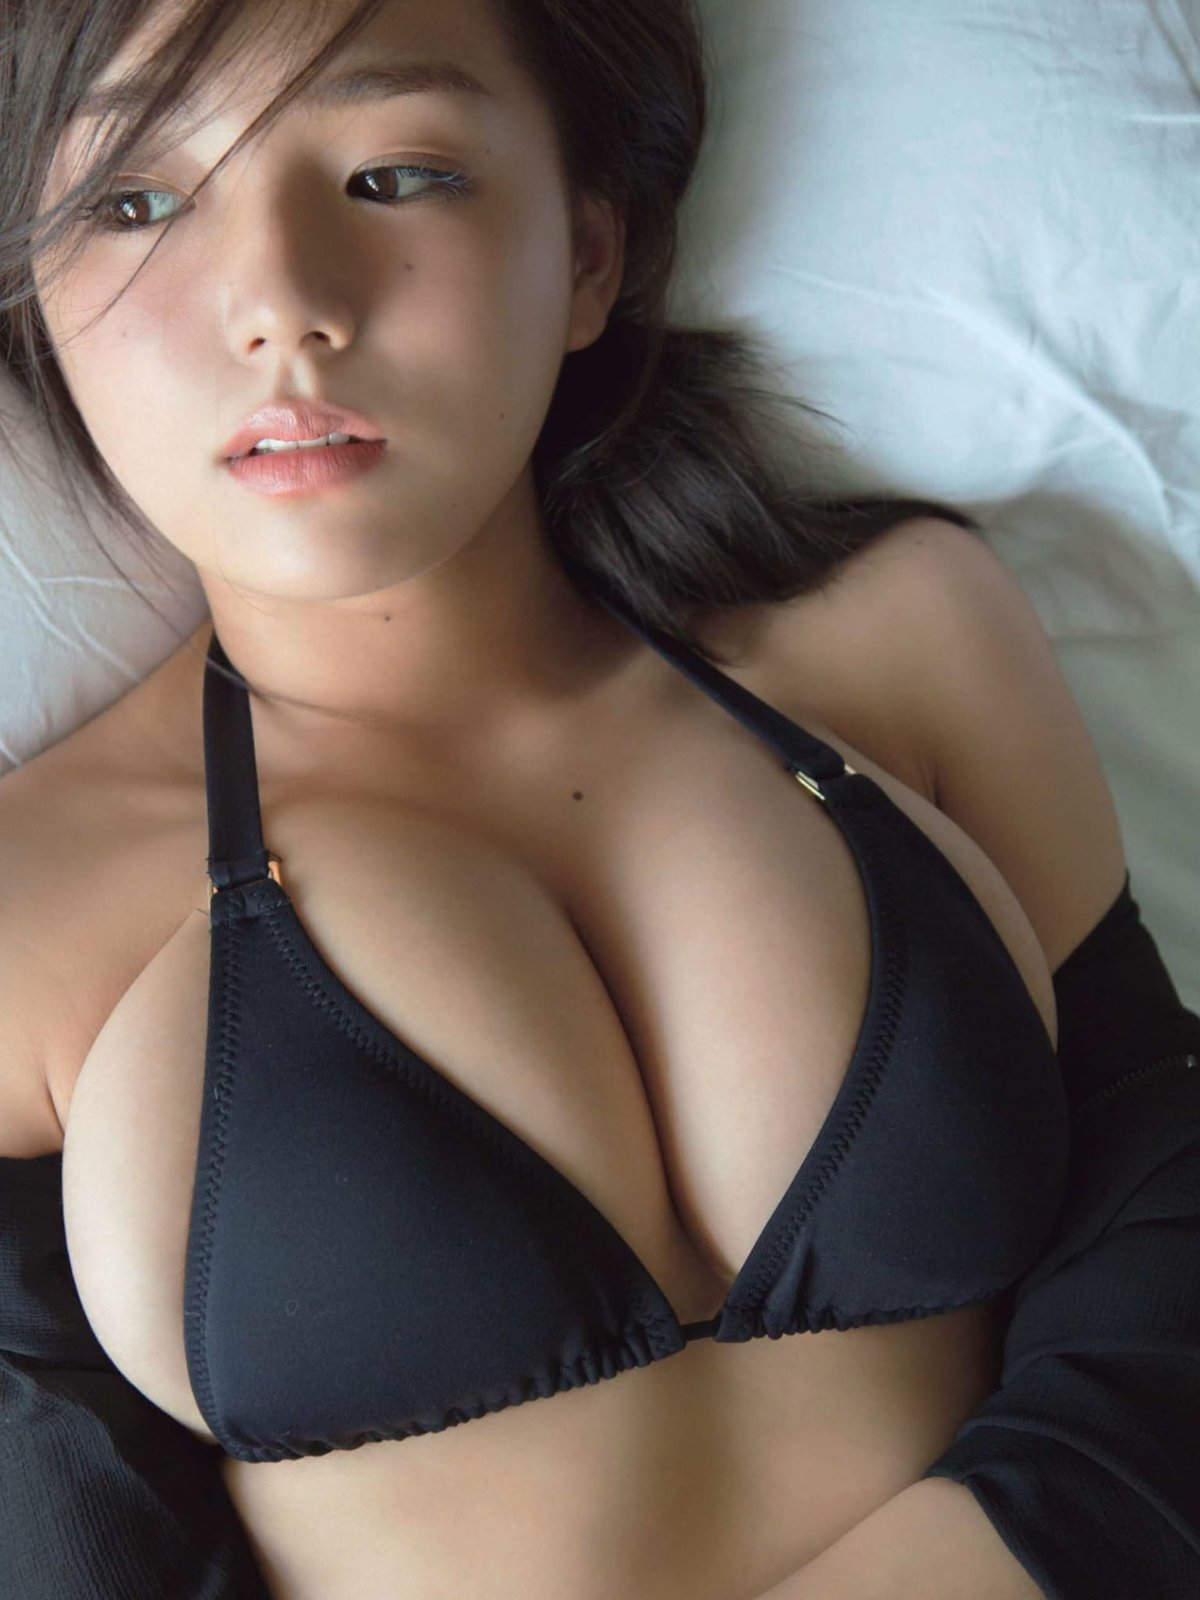 篠崎愛 93 [無断転載禁止]©bbspink.comYouTube動画>16本 ->画像>524枚